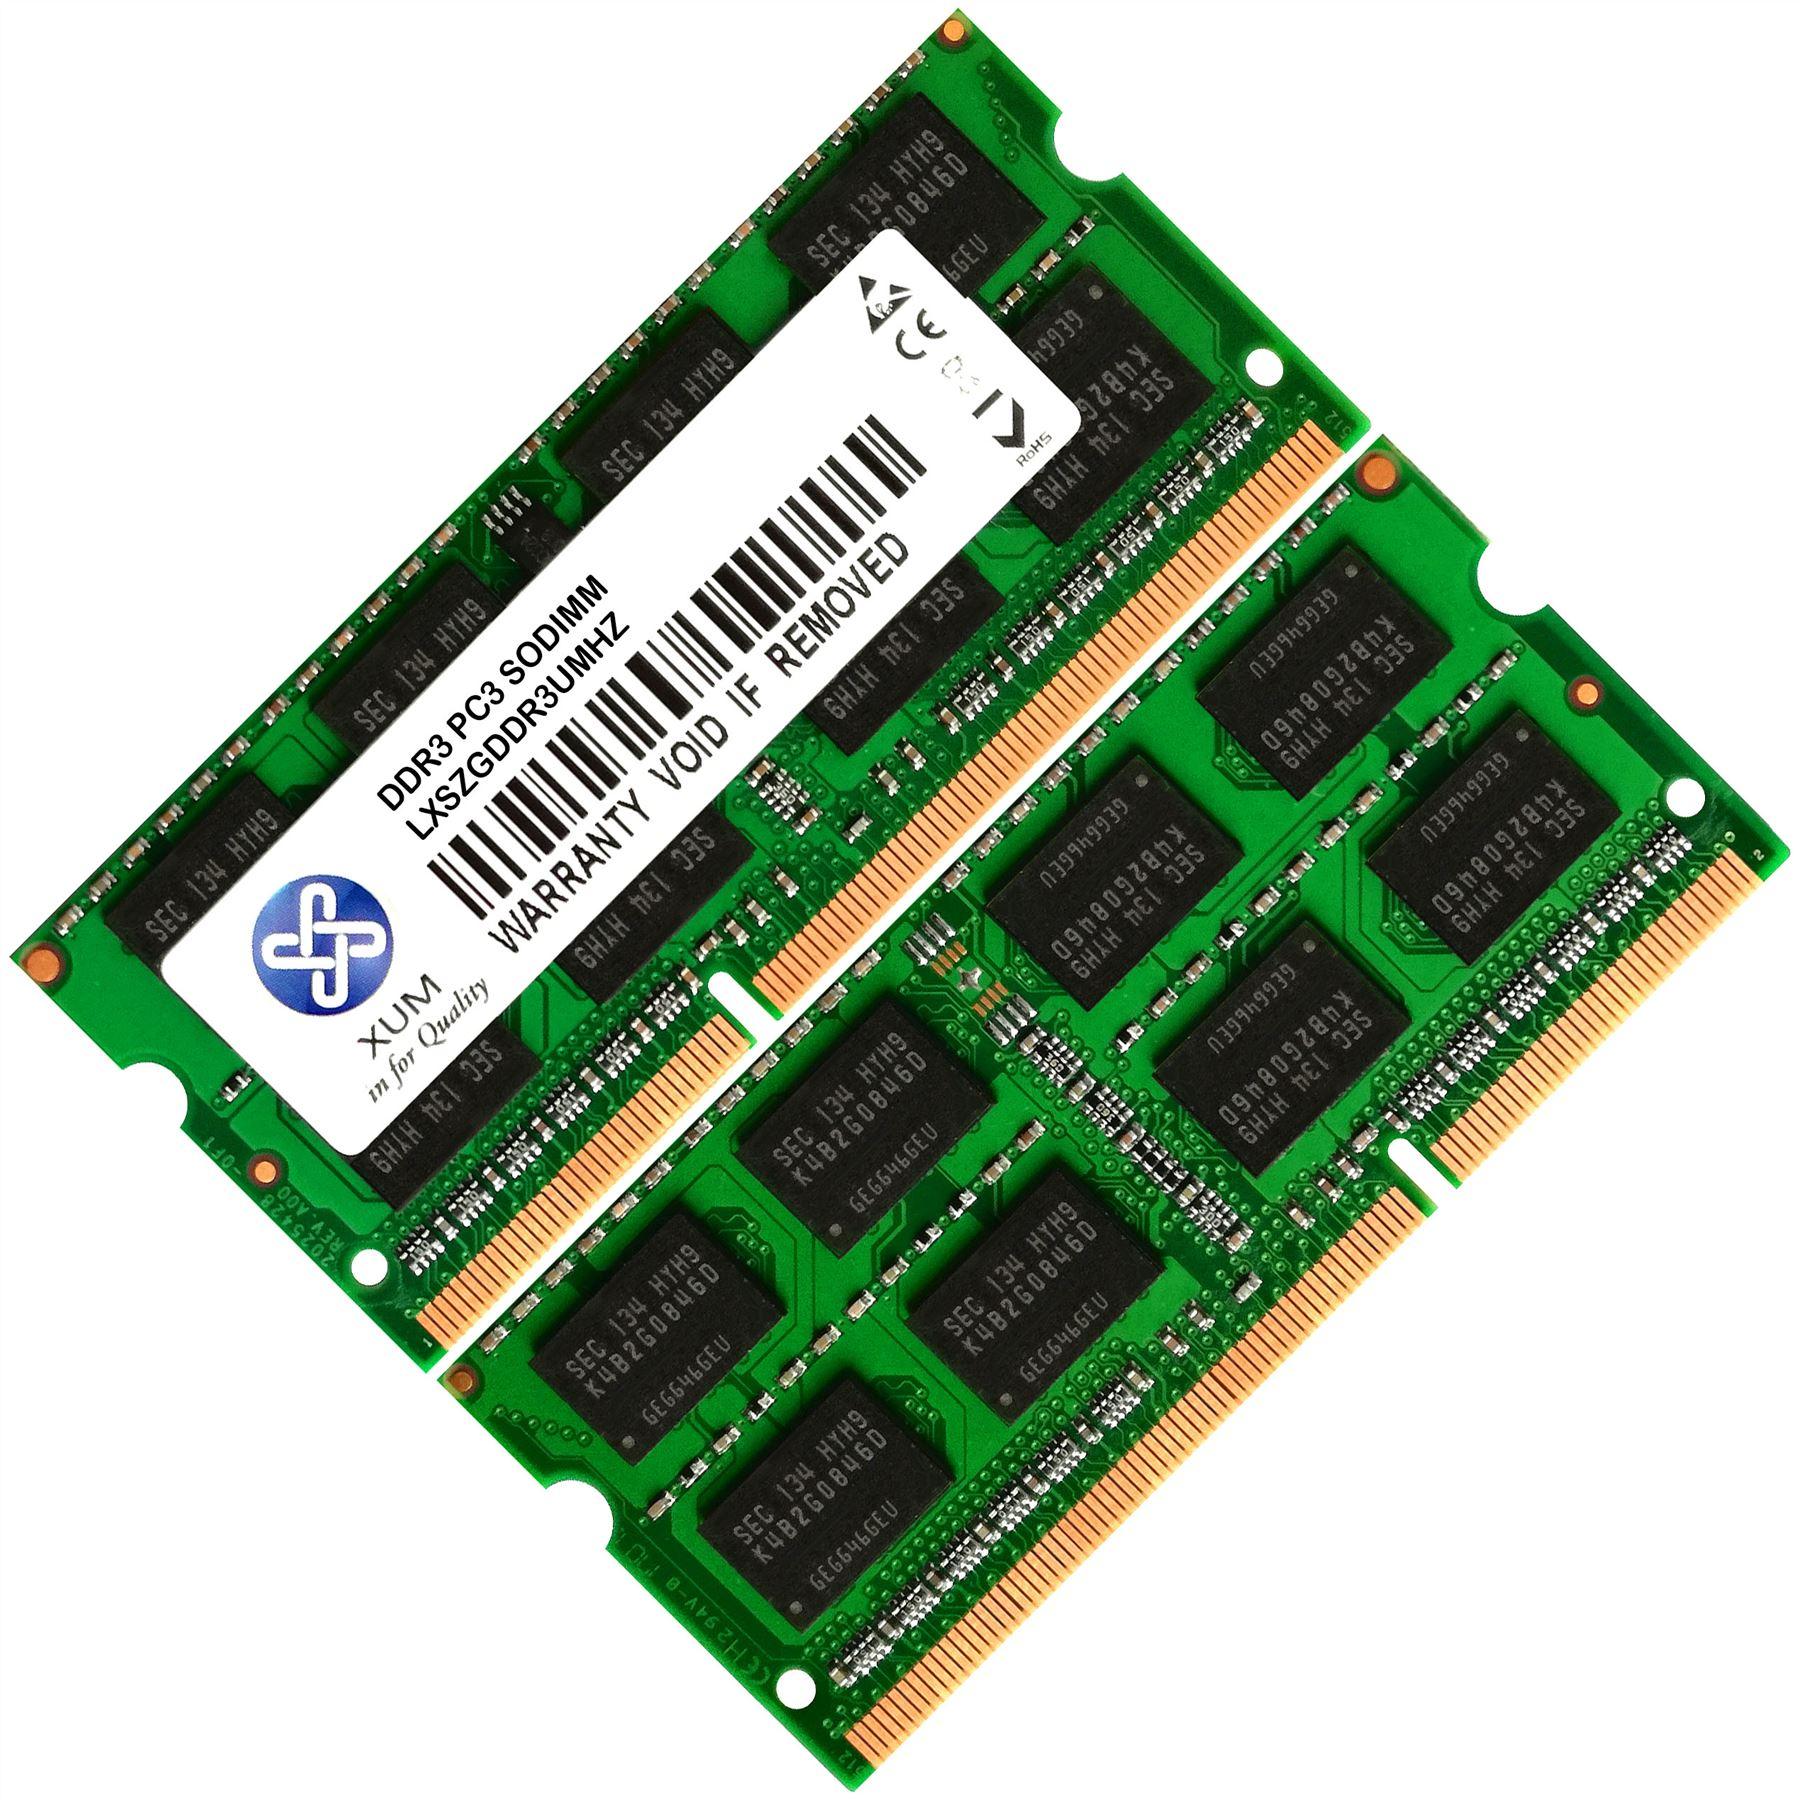 Memoria-Ram-Toshiba-Satellite-Laptop-L70-A-11U-L70-A-11X-Nuevo-Lot-DDR3-SDRAM